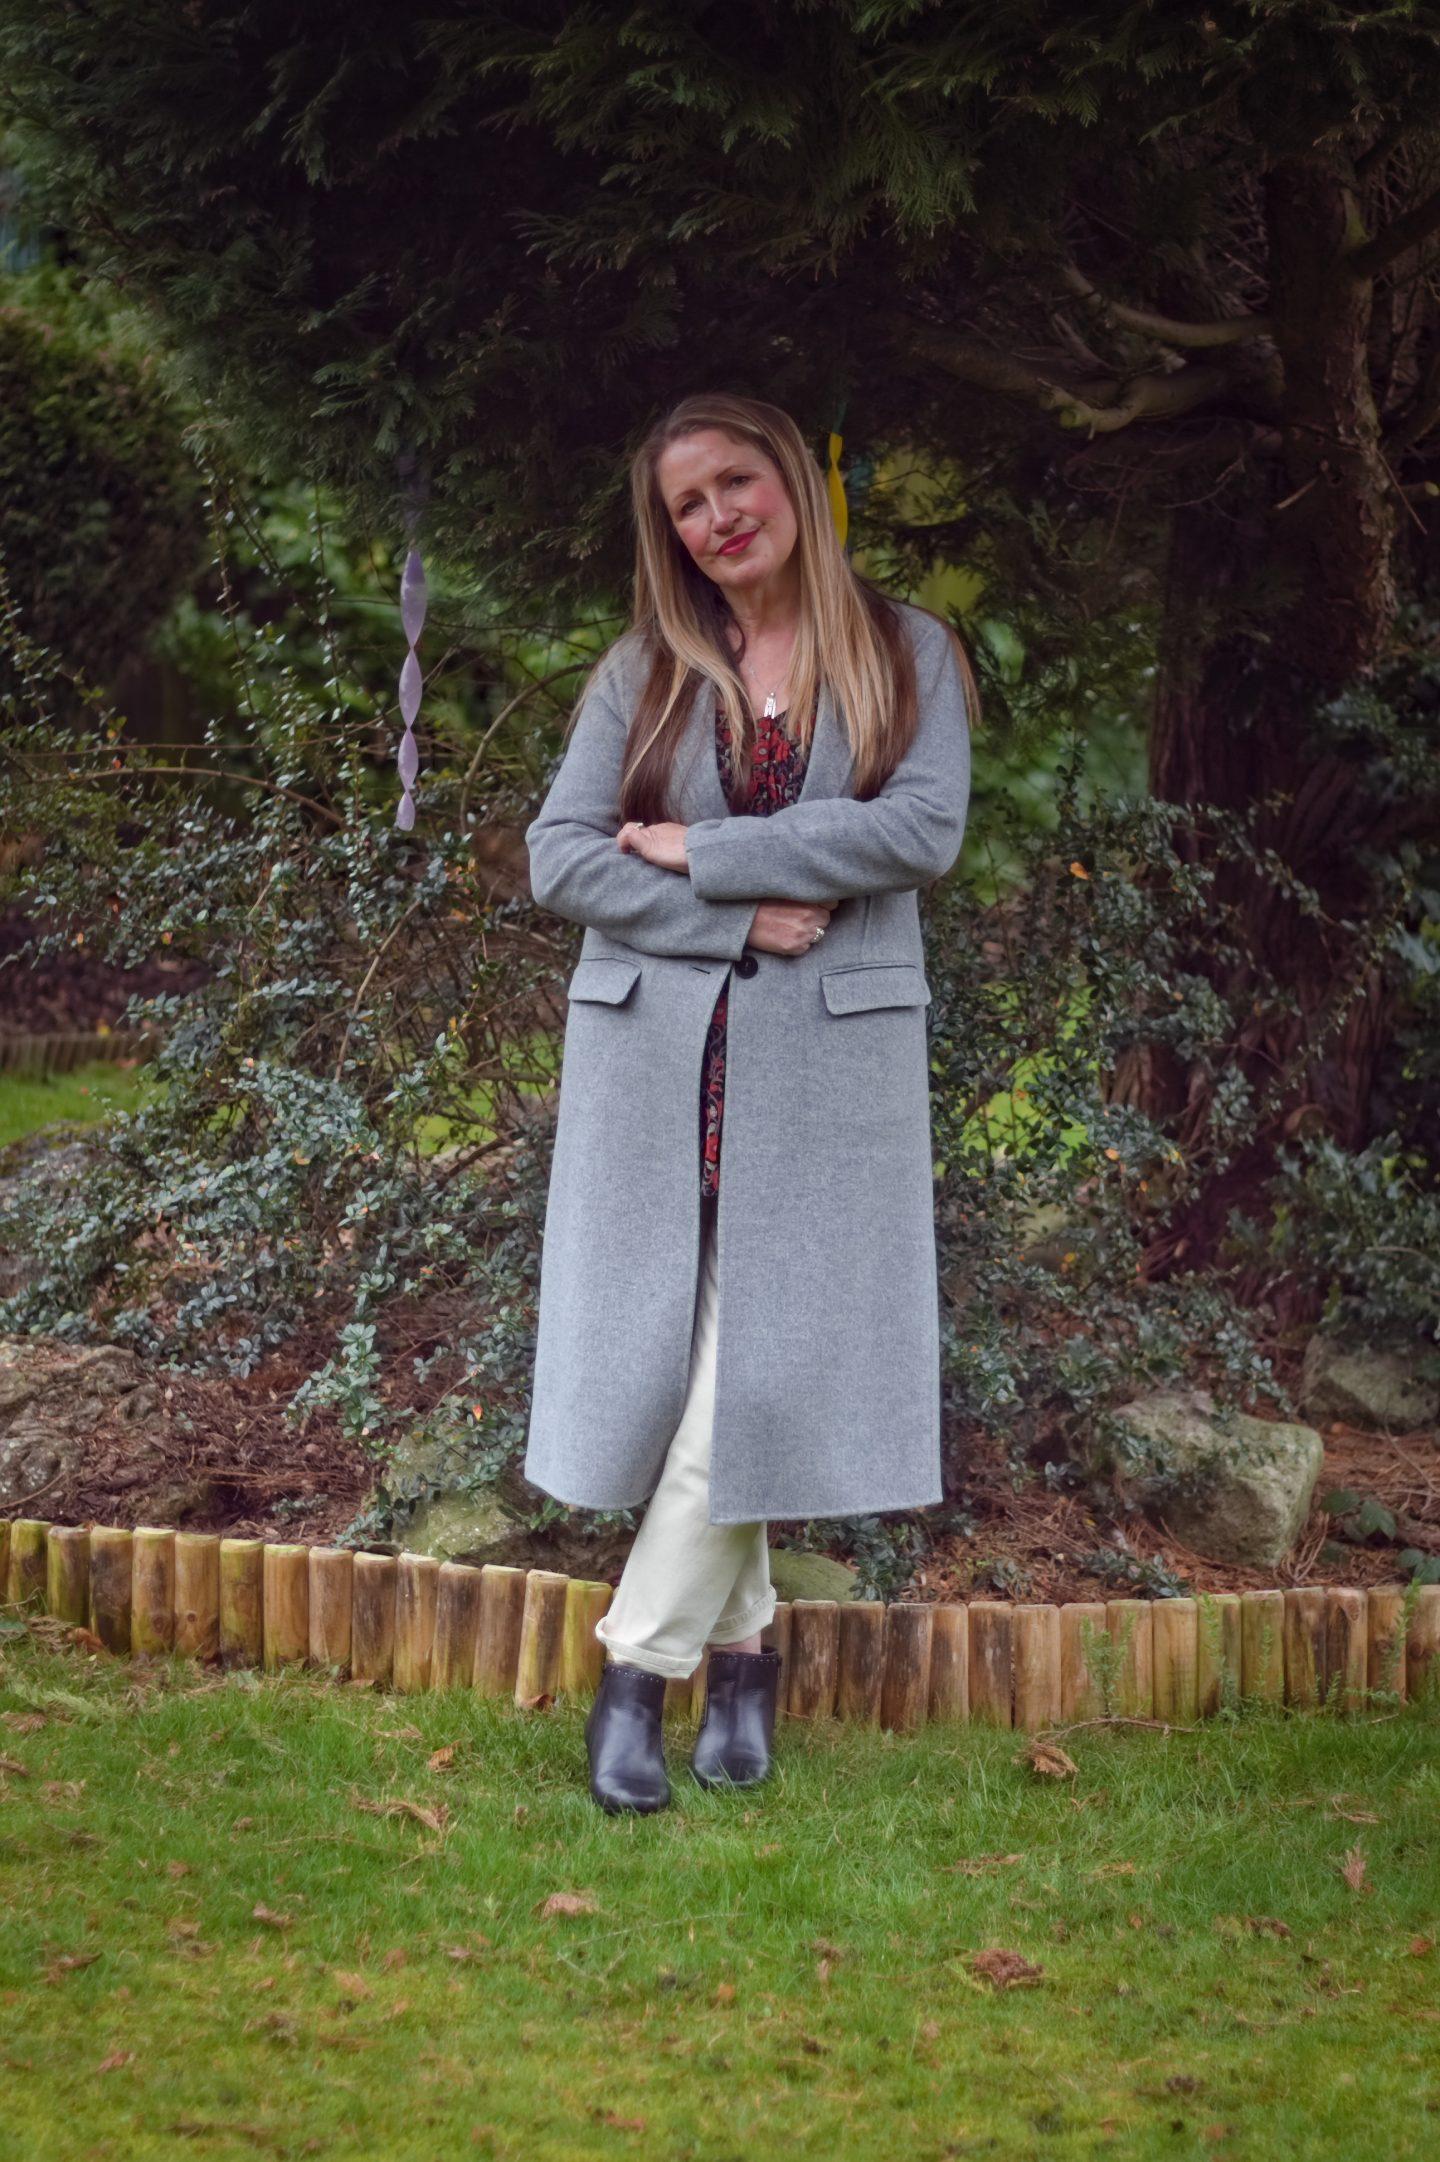 Age, Sustainability and Shopping my Wardrobe